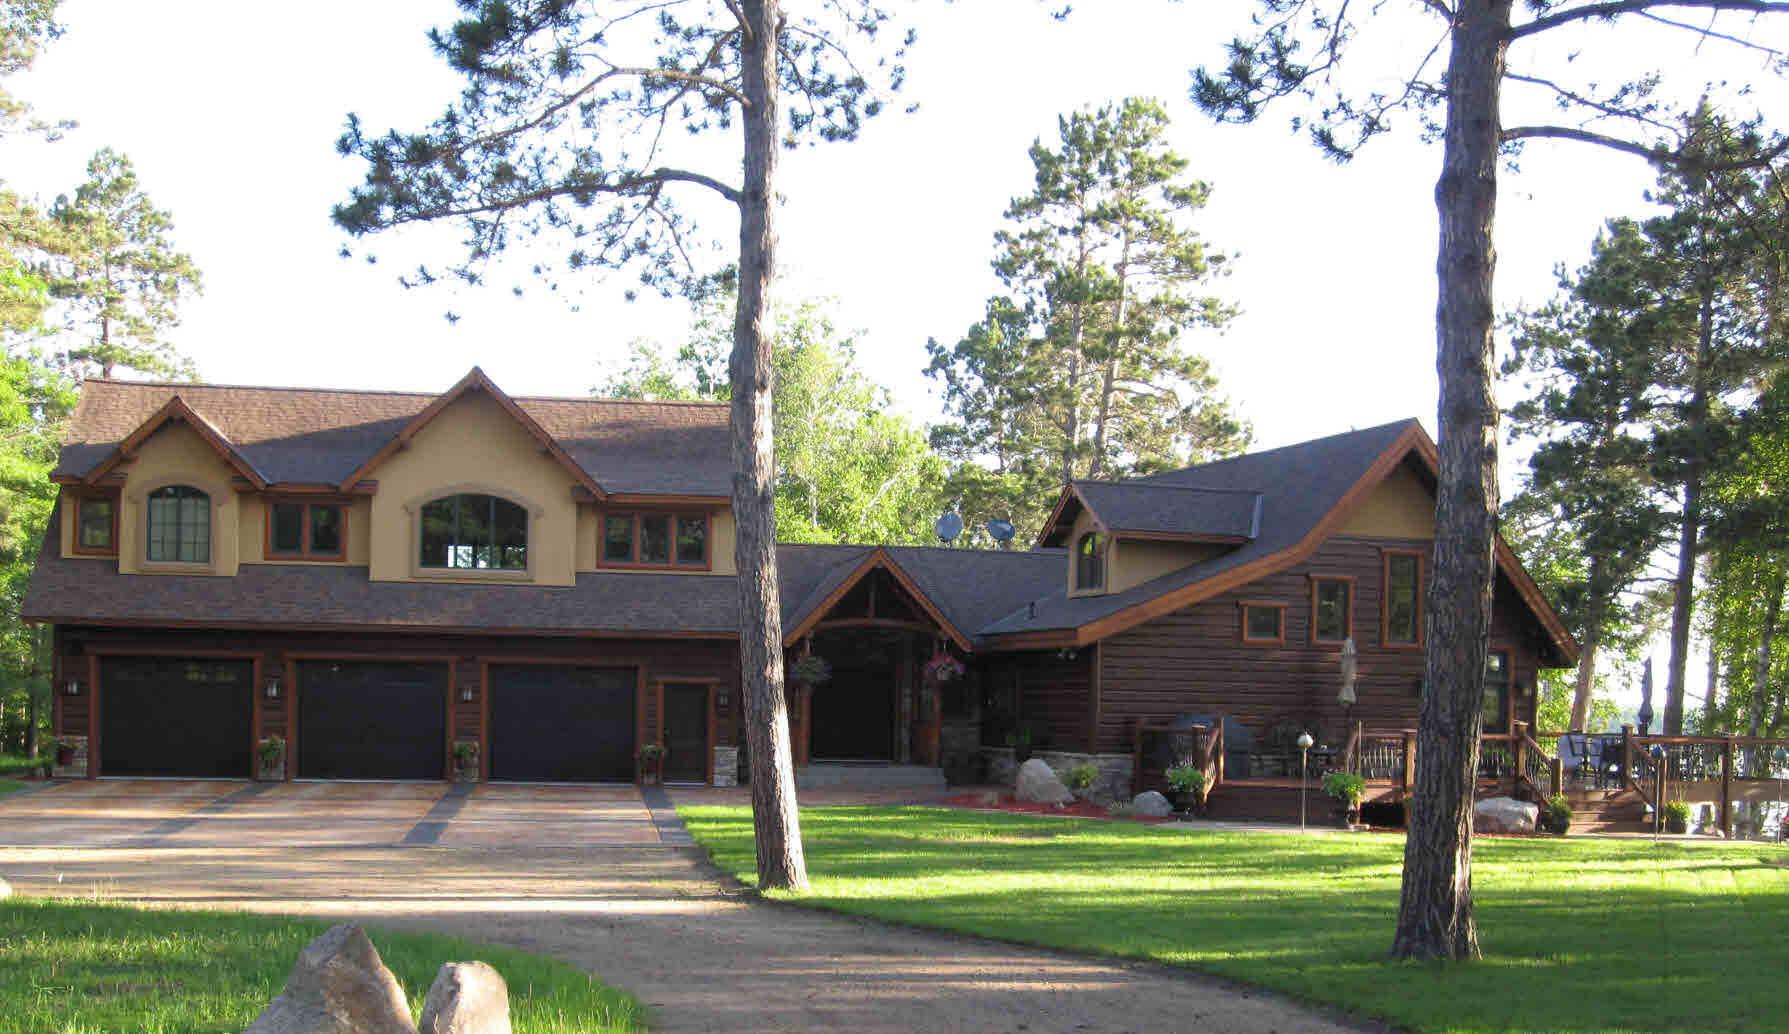 17312 County Road 40, Park Rapids, Minnesota 56470